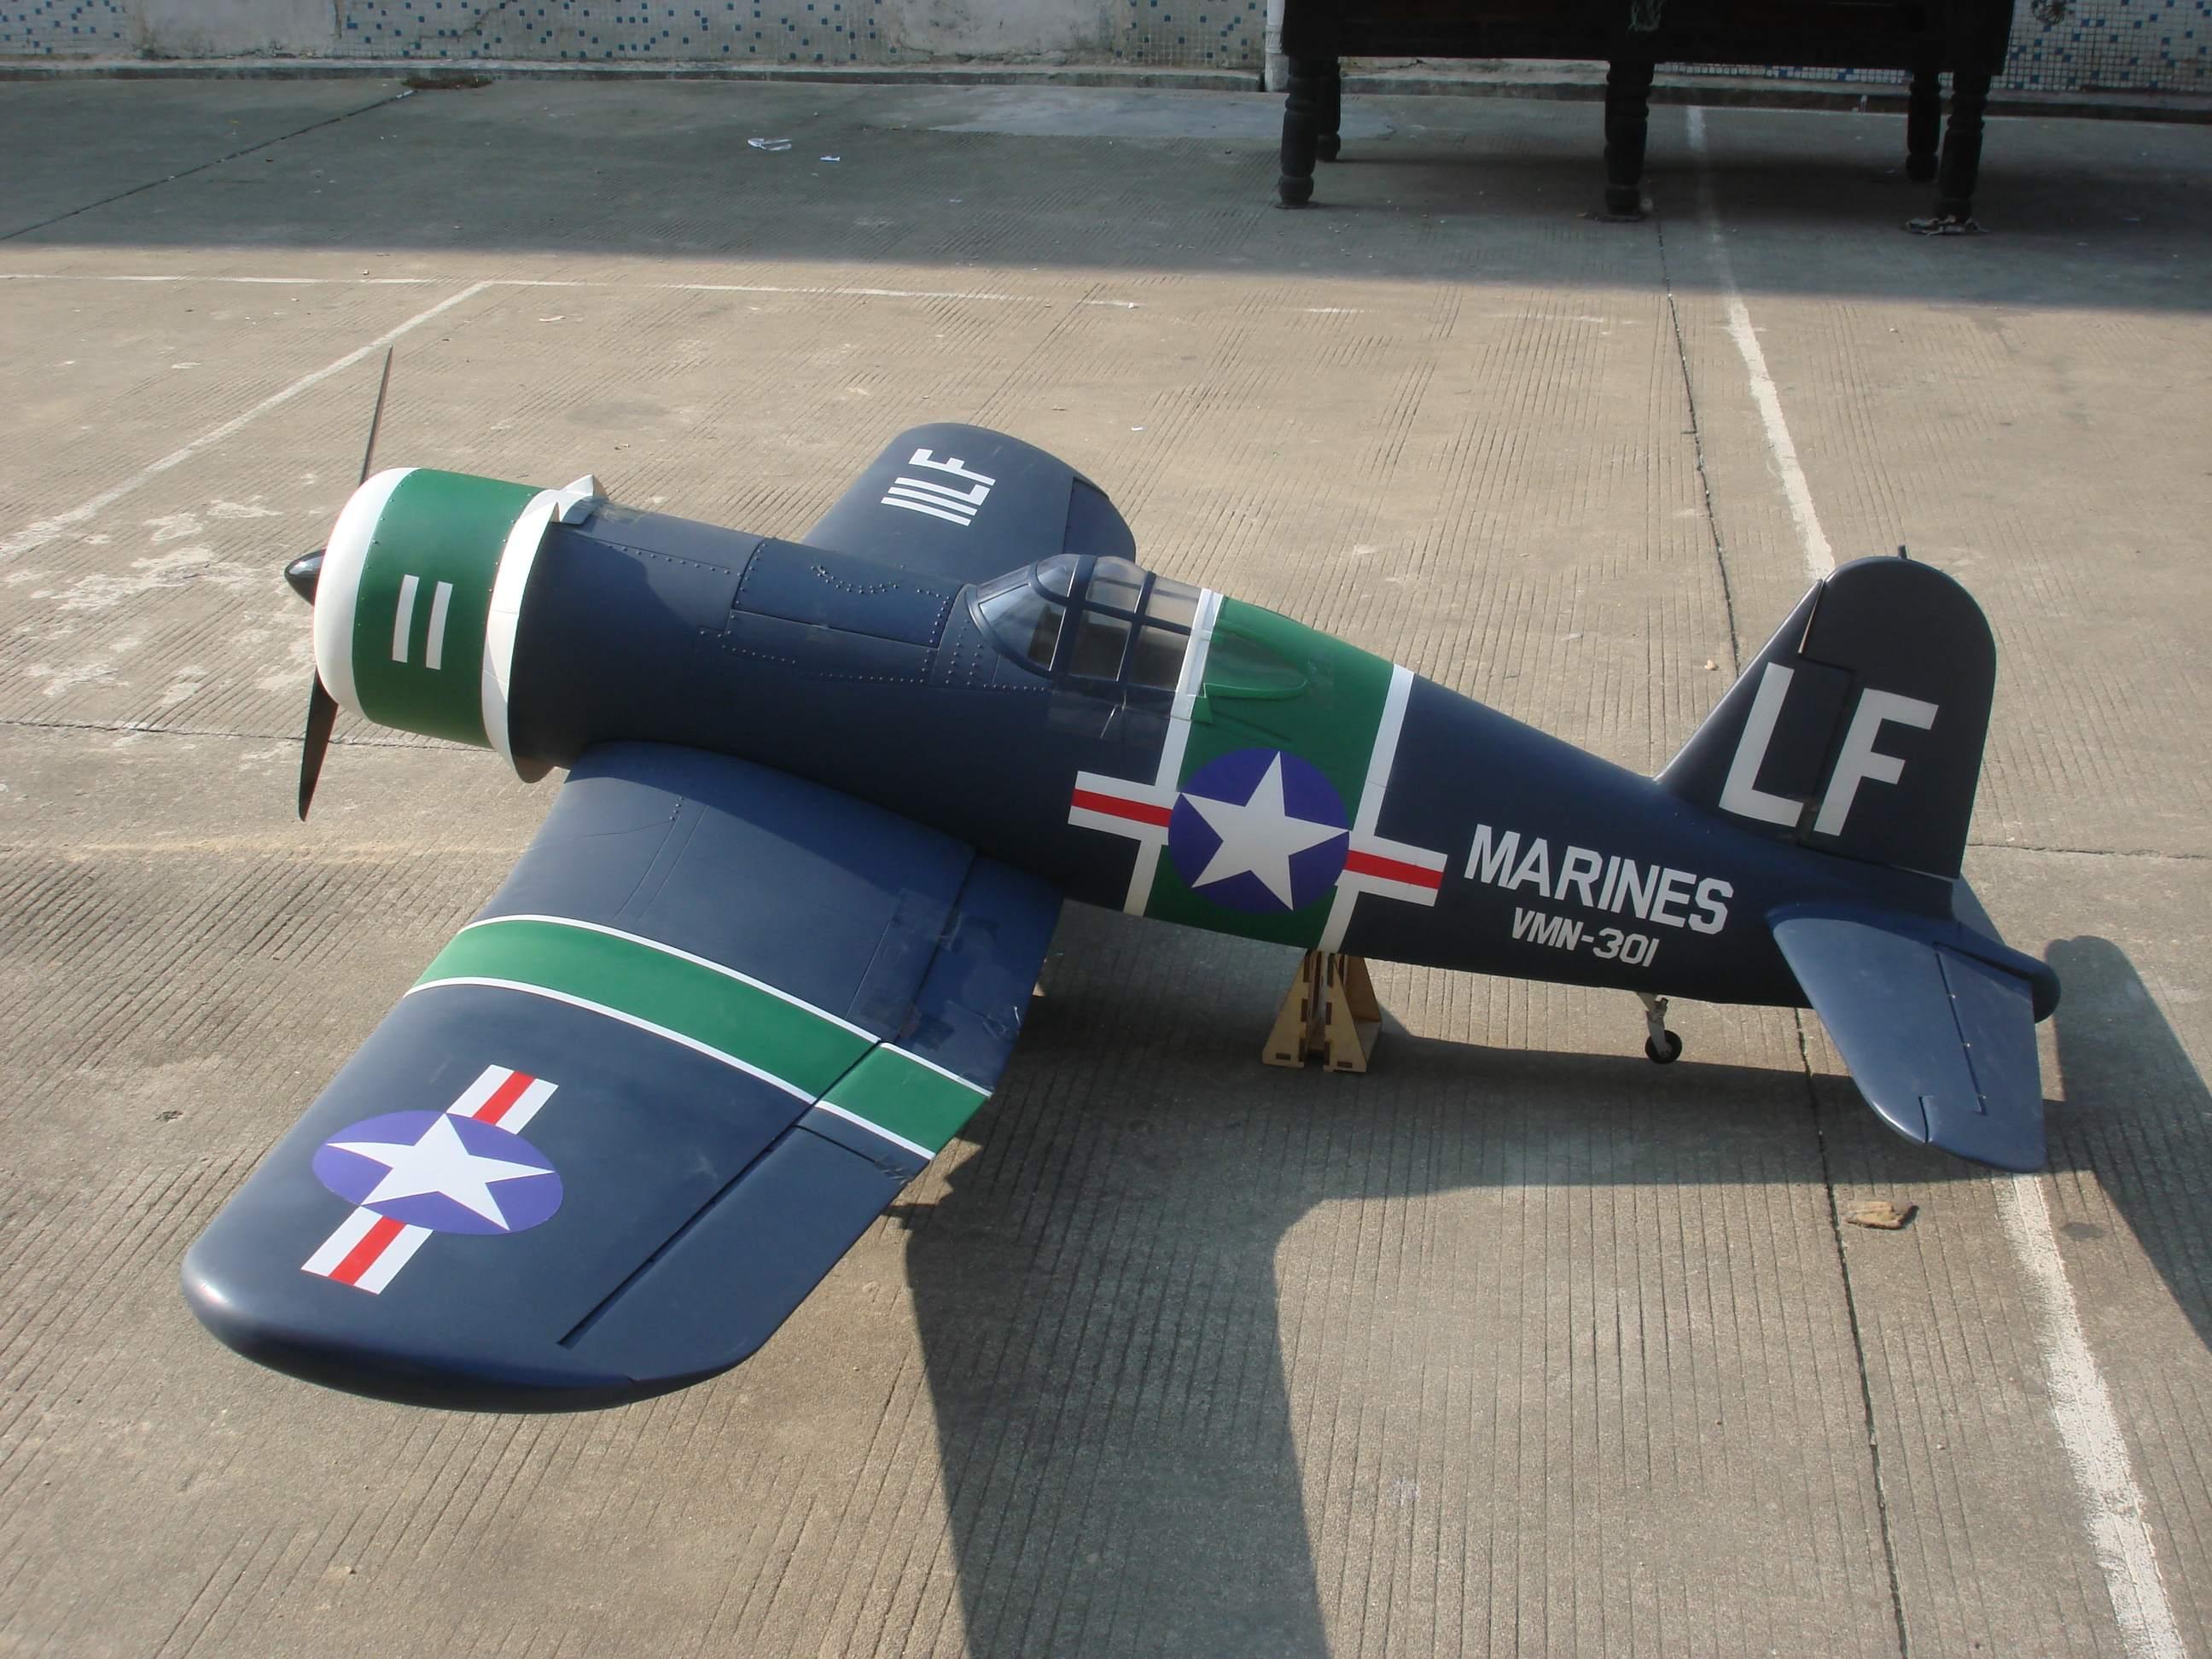 Corsair F4U 100cc Cy Models - CY-CY8007B | Miniplanes